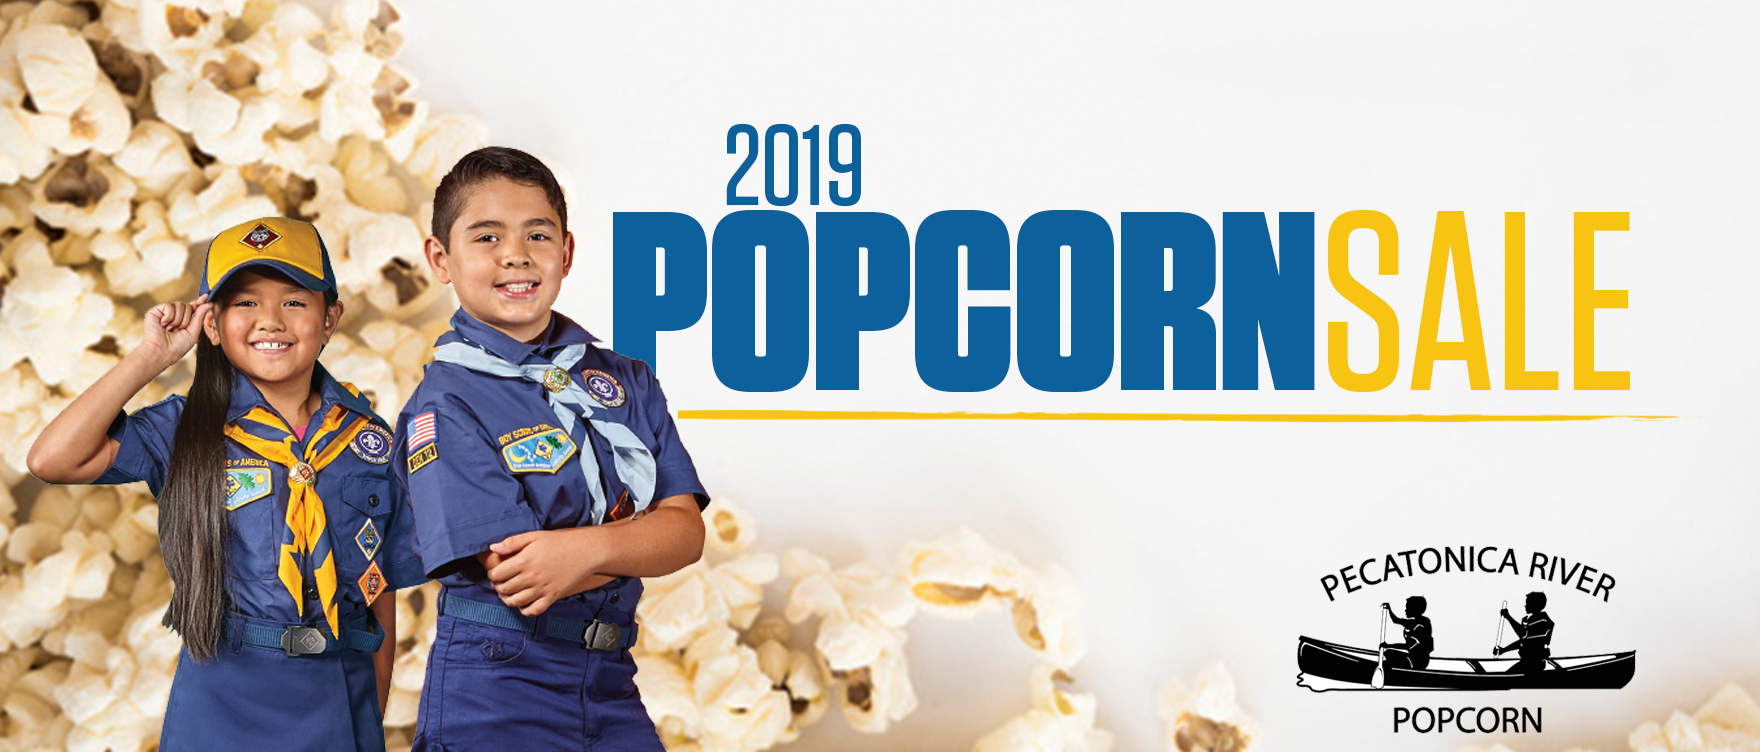 Bsa popcorn sales prizes clip